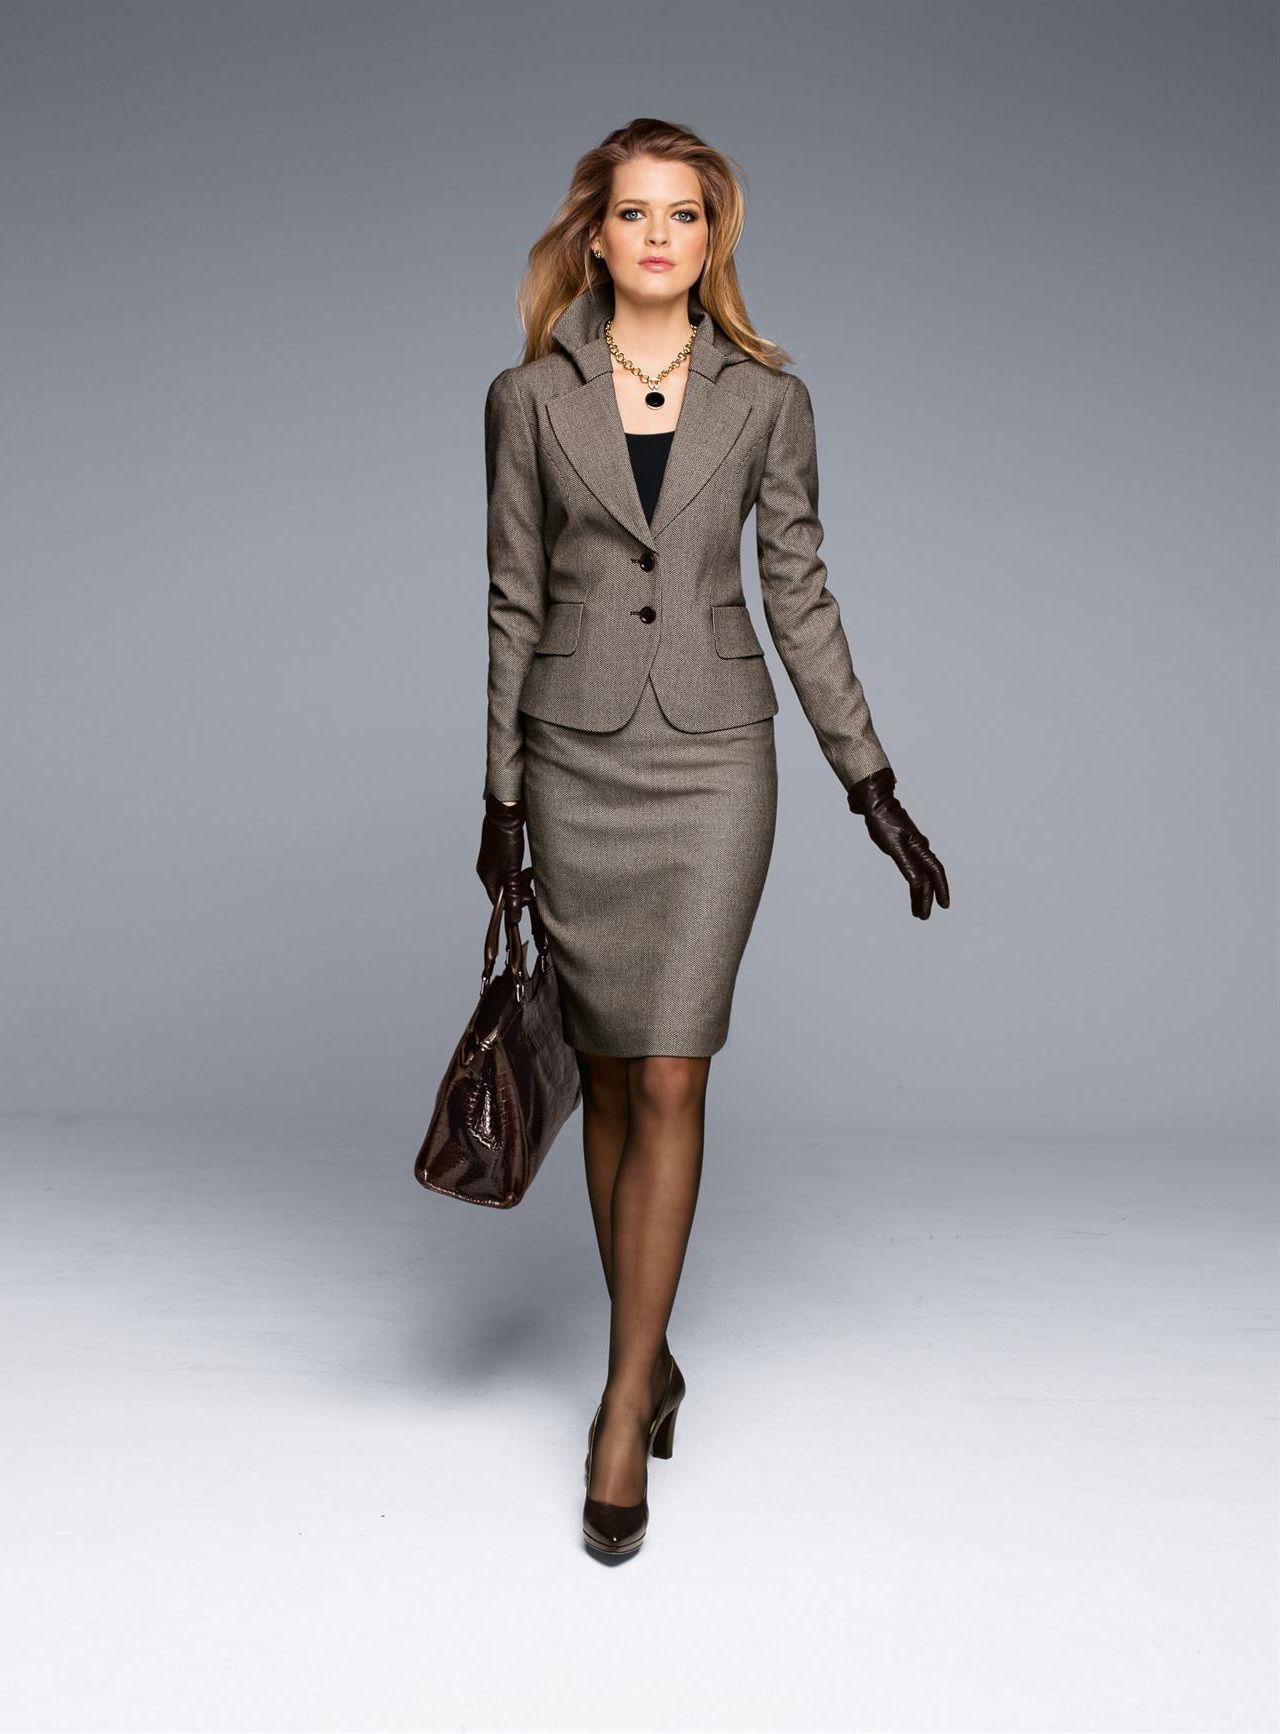 Skirt suits, uniforms, amazing dresses...: Photo   Buscando Tu ...